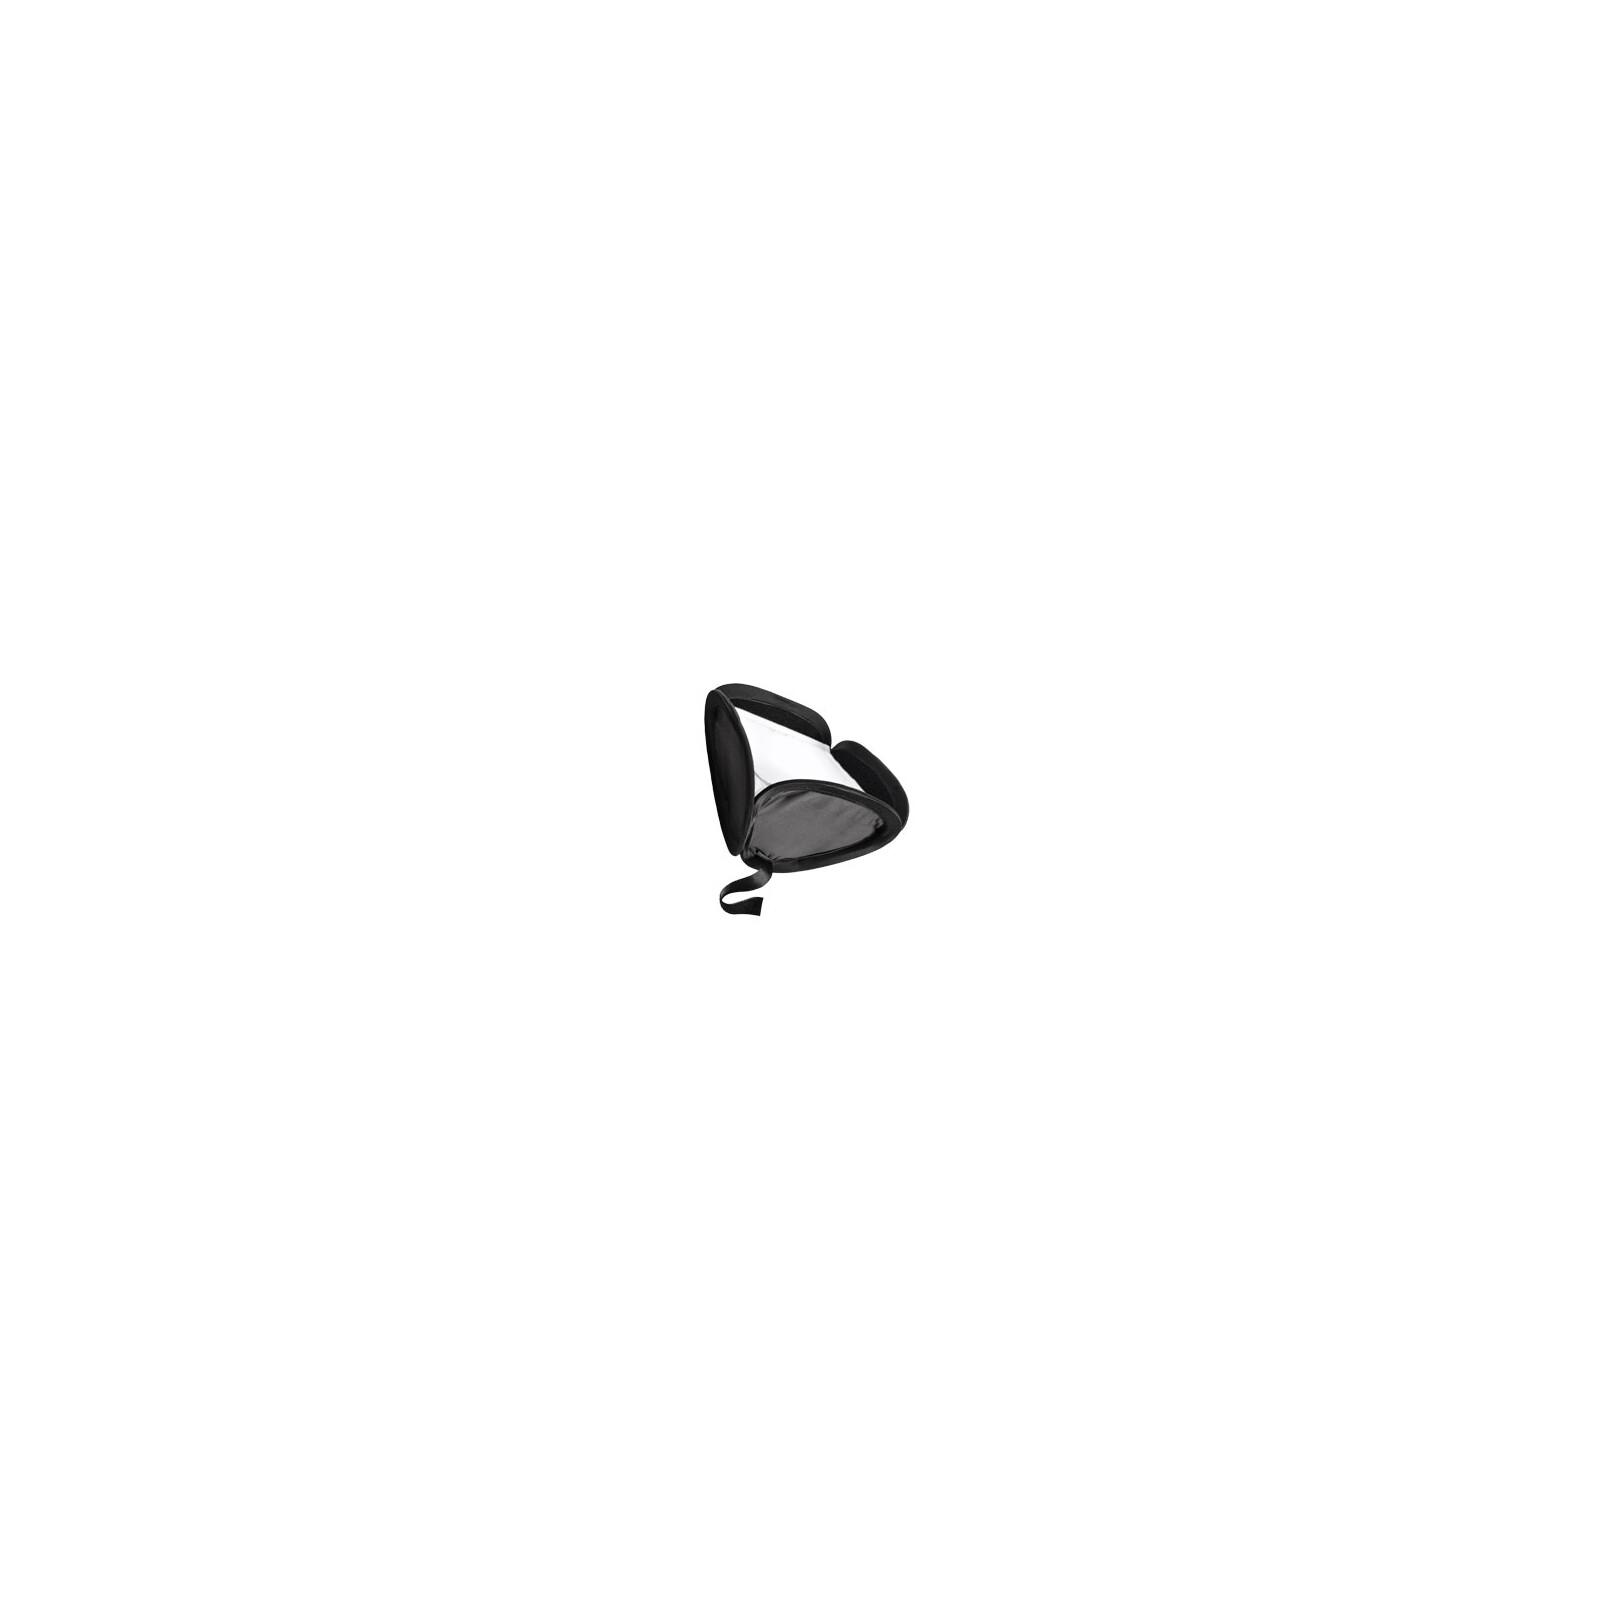 walimex Magic Softbox 23x23cm für Systemblitz